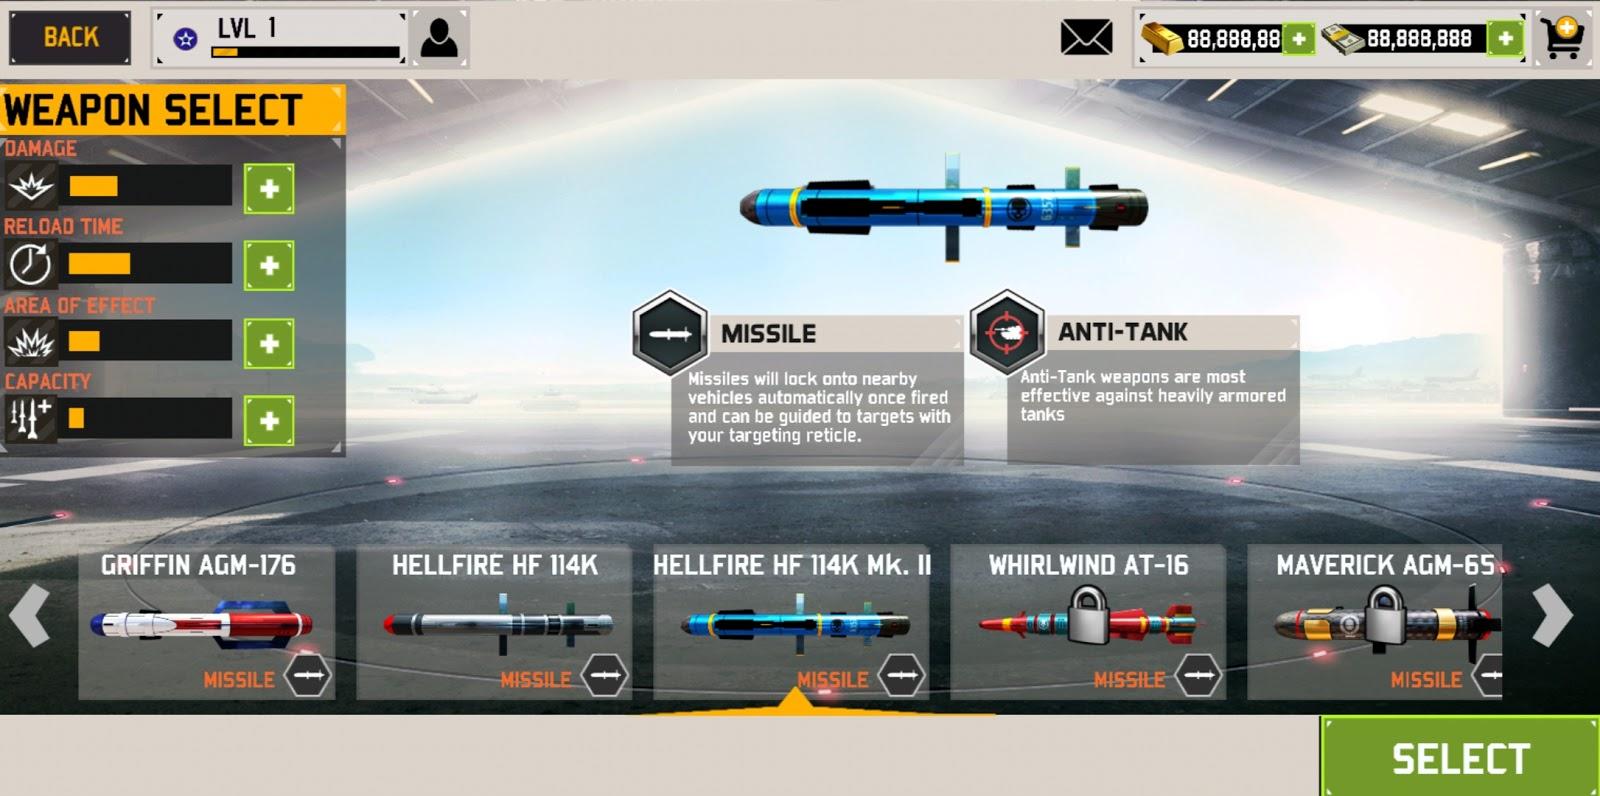 Drone Shadow Strike 3 Mod Apk Data Version 1 3 148 Unlimited